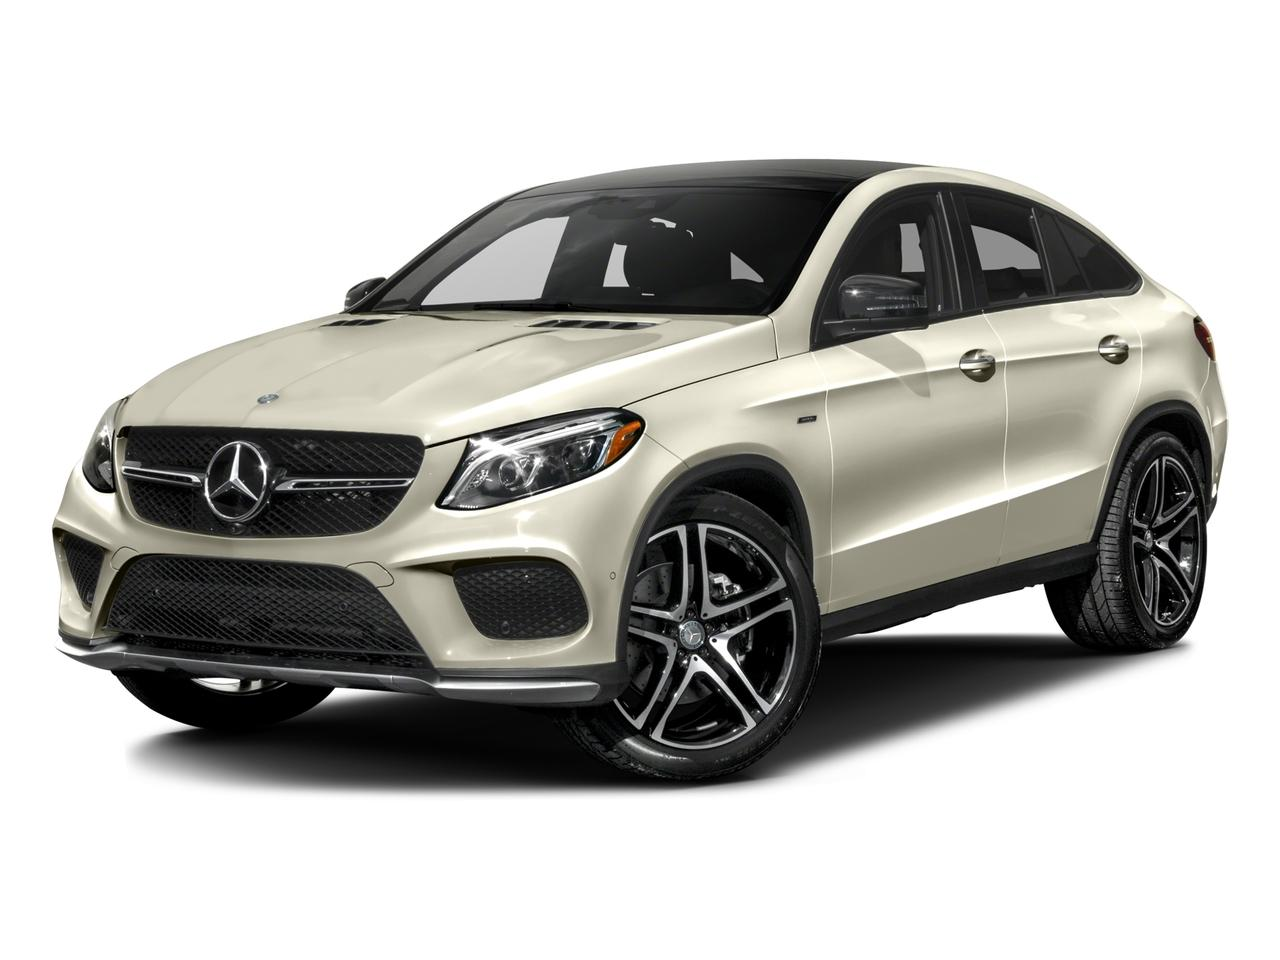 2016 Mercedes-Benz GLE Vehicle Photo in Corpus Christi, TX 78411